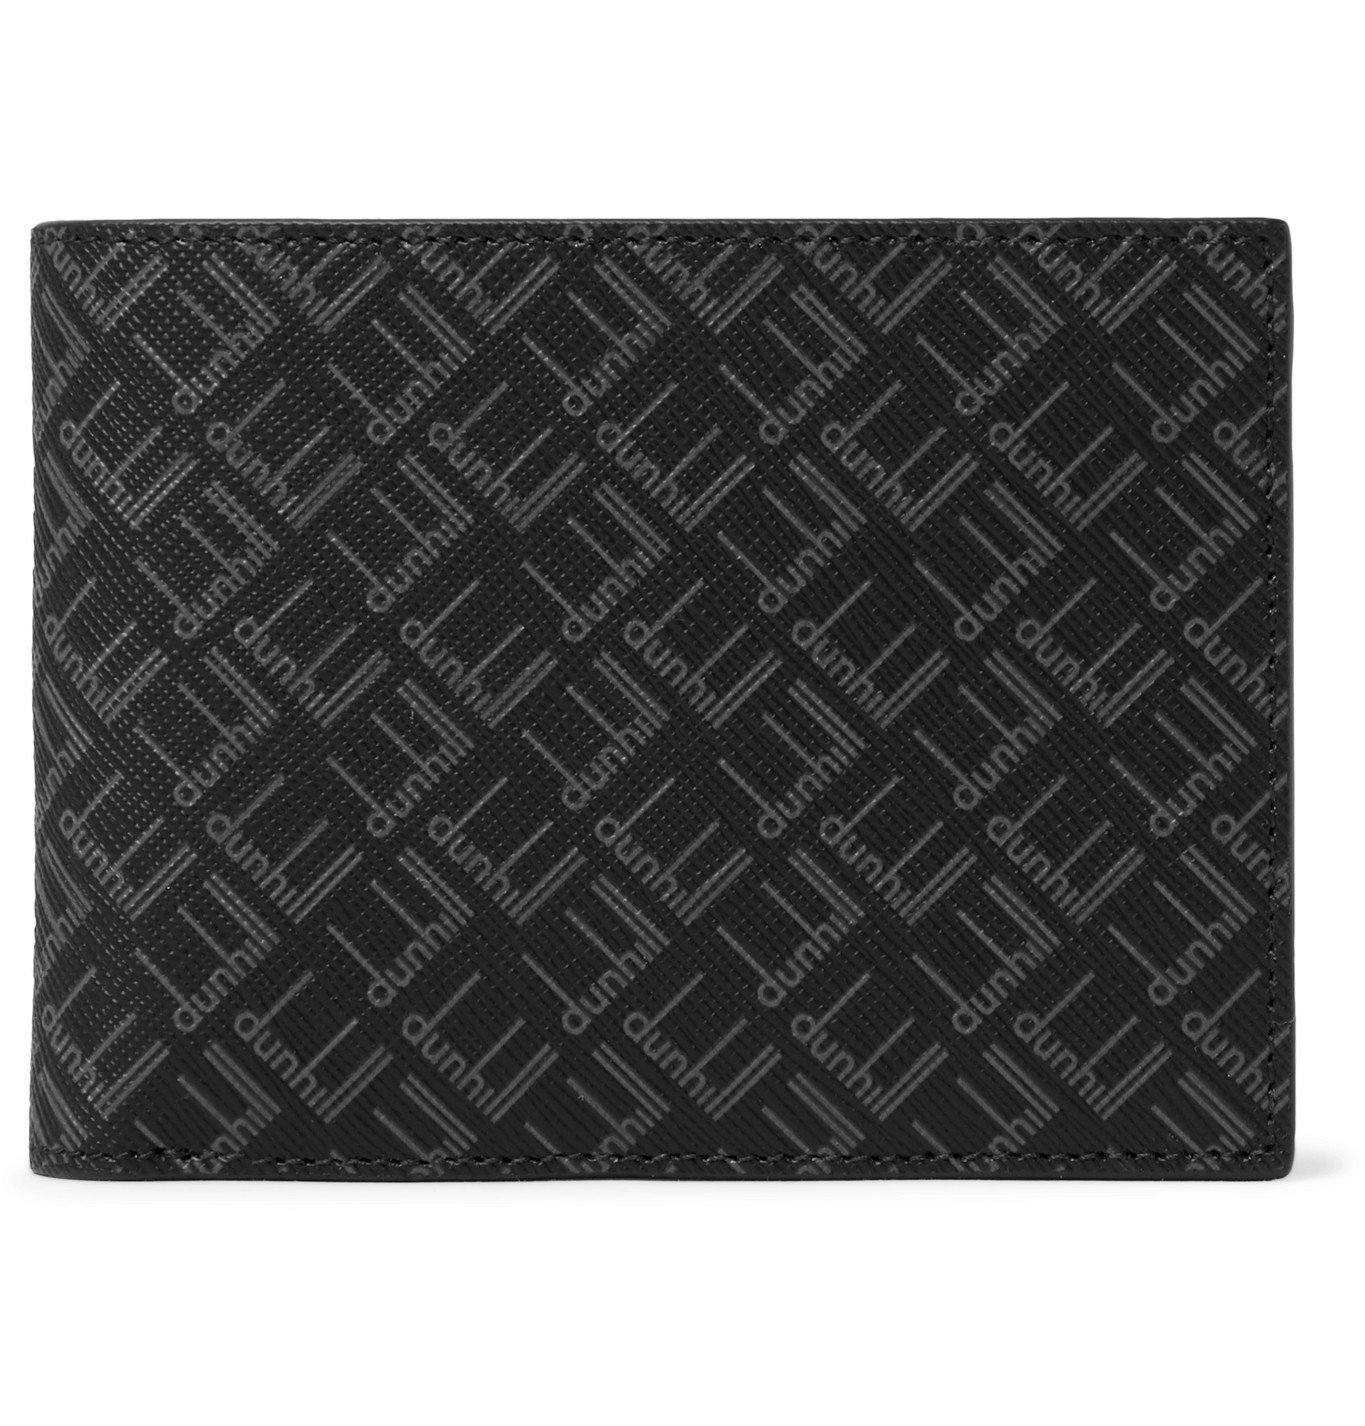 Dunhill - Logo-Print Coated-Canvas Billfold Wallet - Black